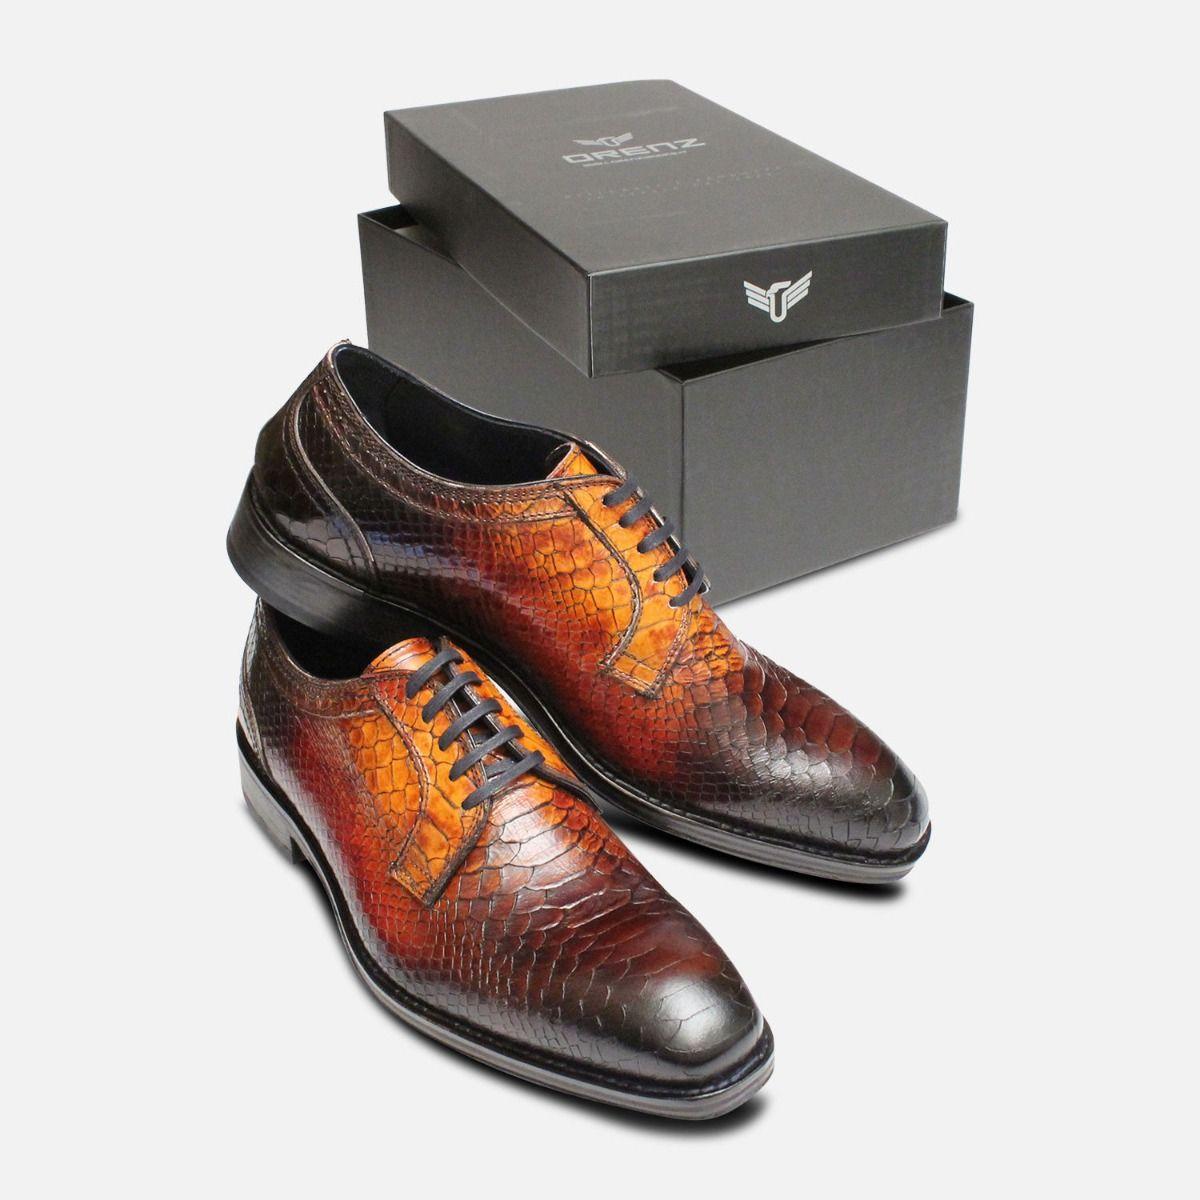 Luxury Brown Italian Snakeskin Shoes